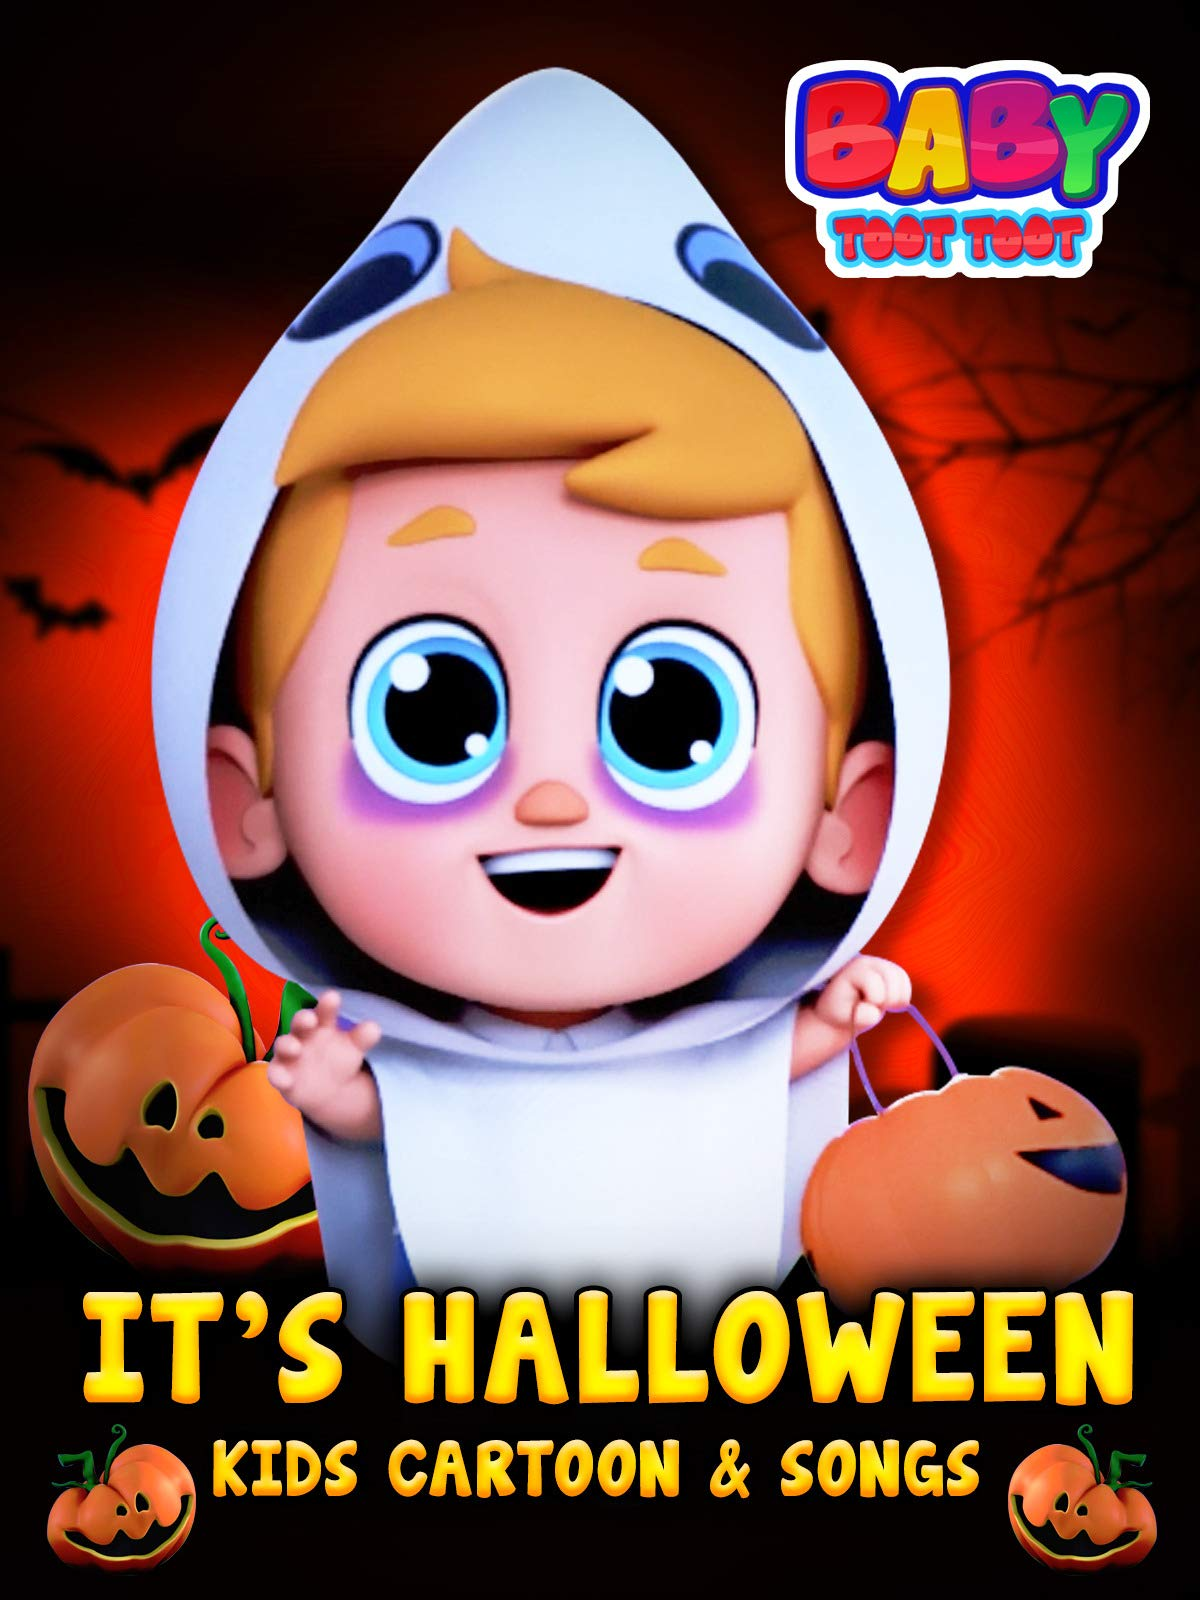 It's Halloween Kids Cartoon and Songs - Baby Toot Toot on Amazon Prime Video UK